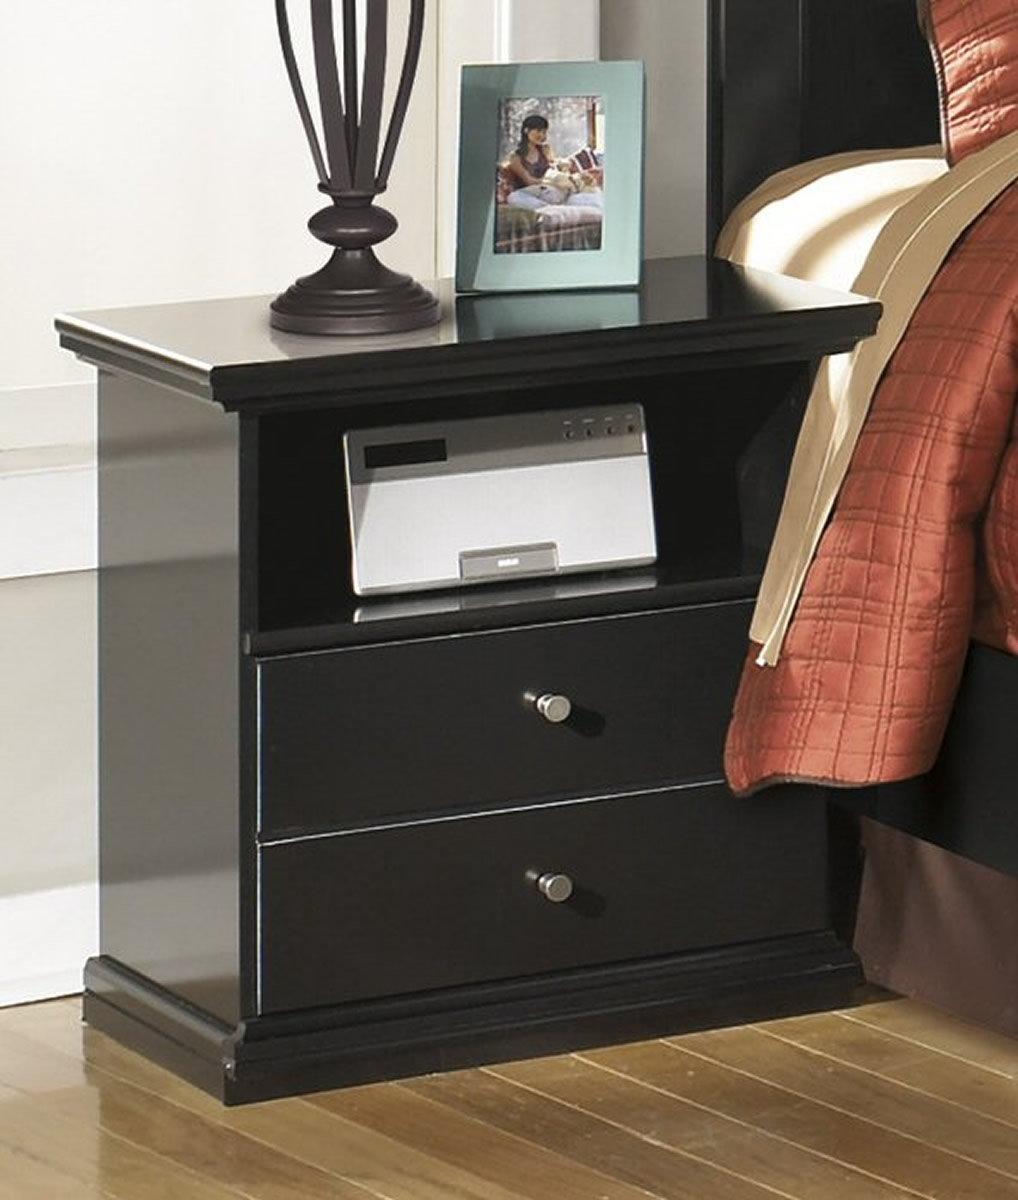 Amazon com maribel one drawer bedroom nightstand black finish kitchen dining